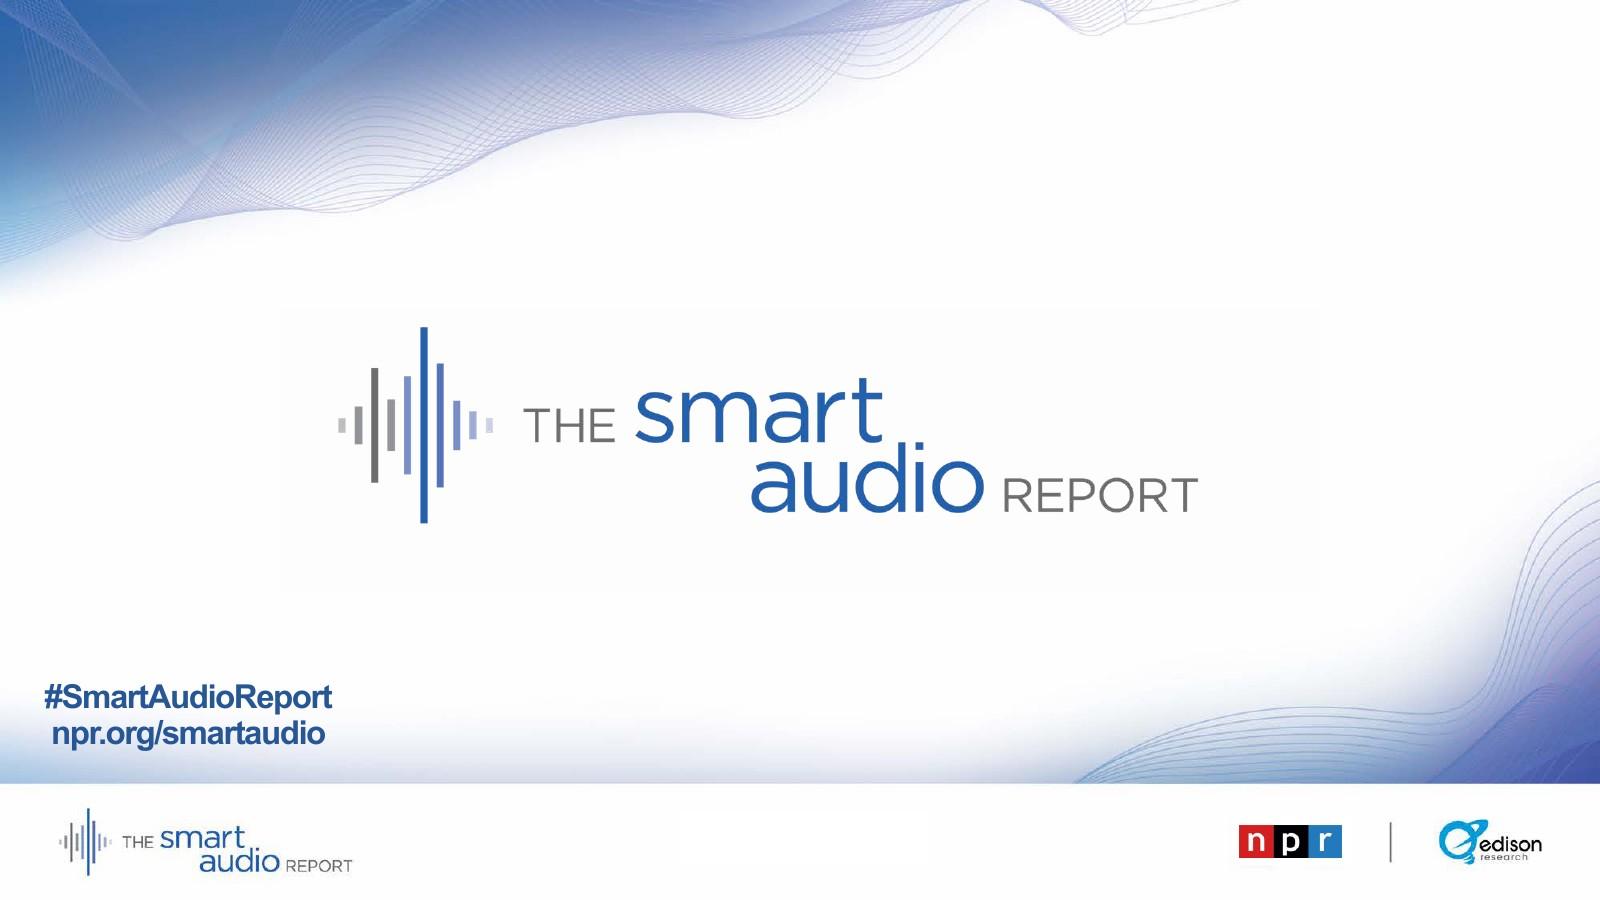 NPR:2020年智能音频报告